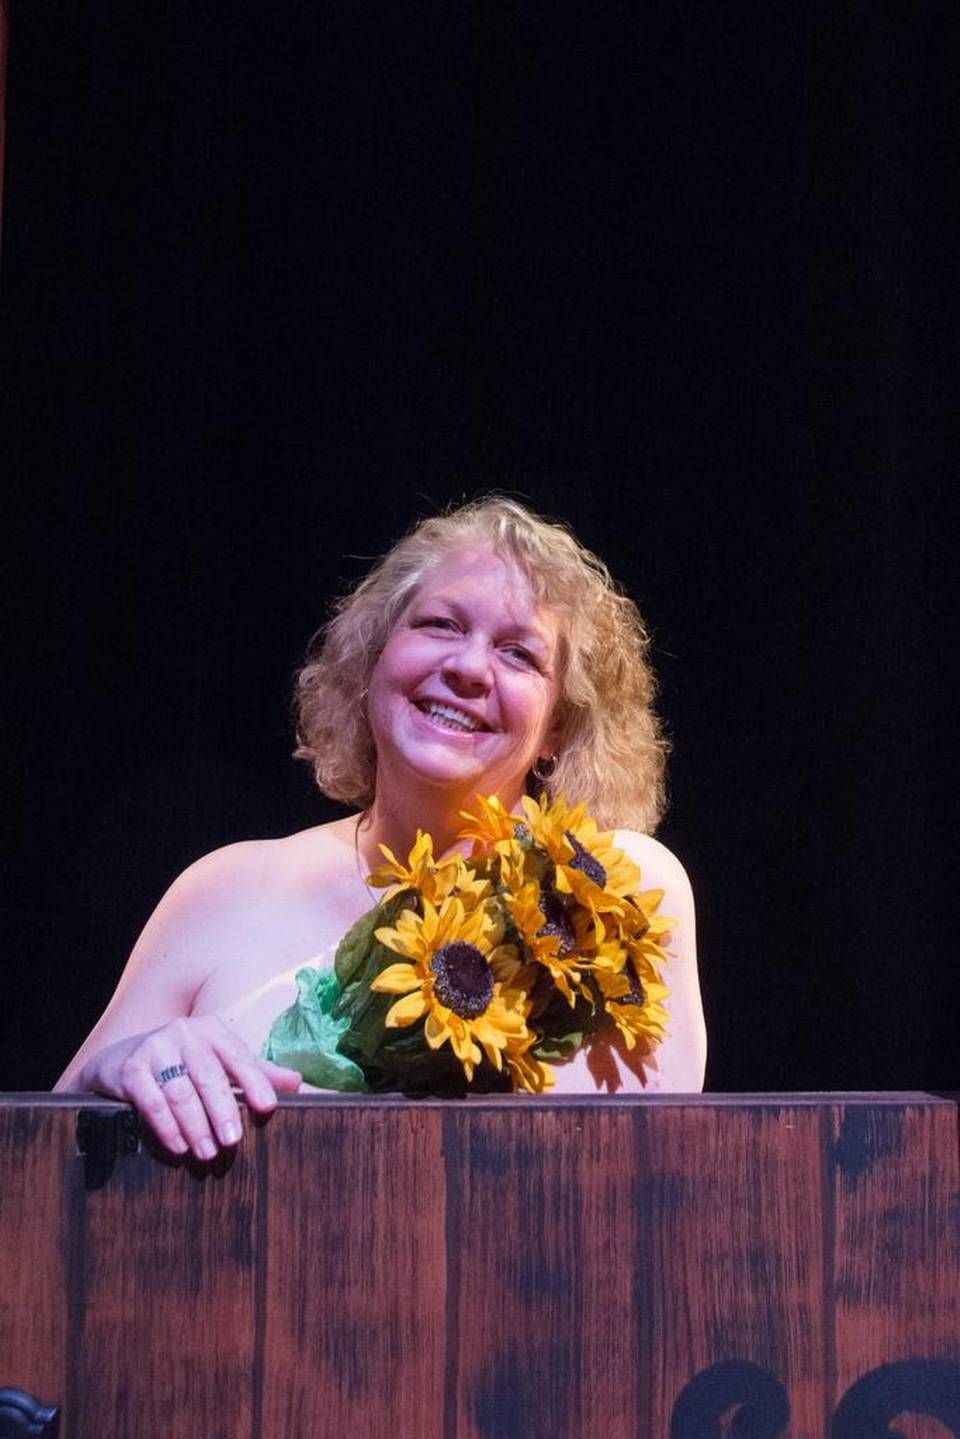 Best Bets: Calendar Girls at Woodford Theatre